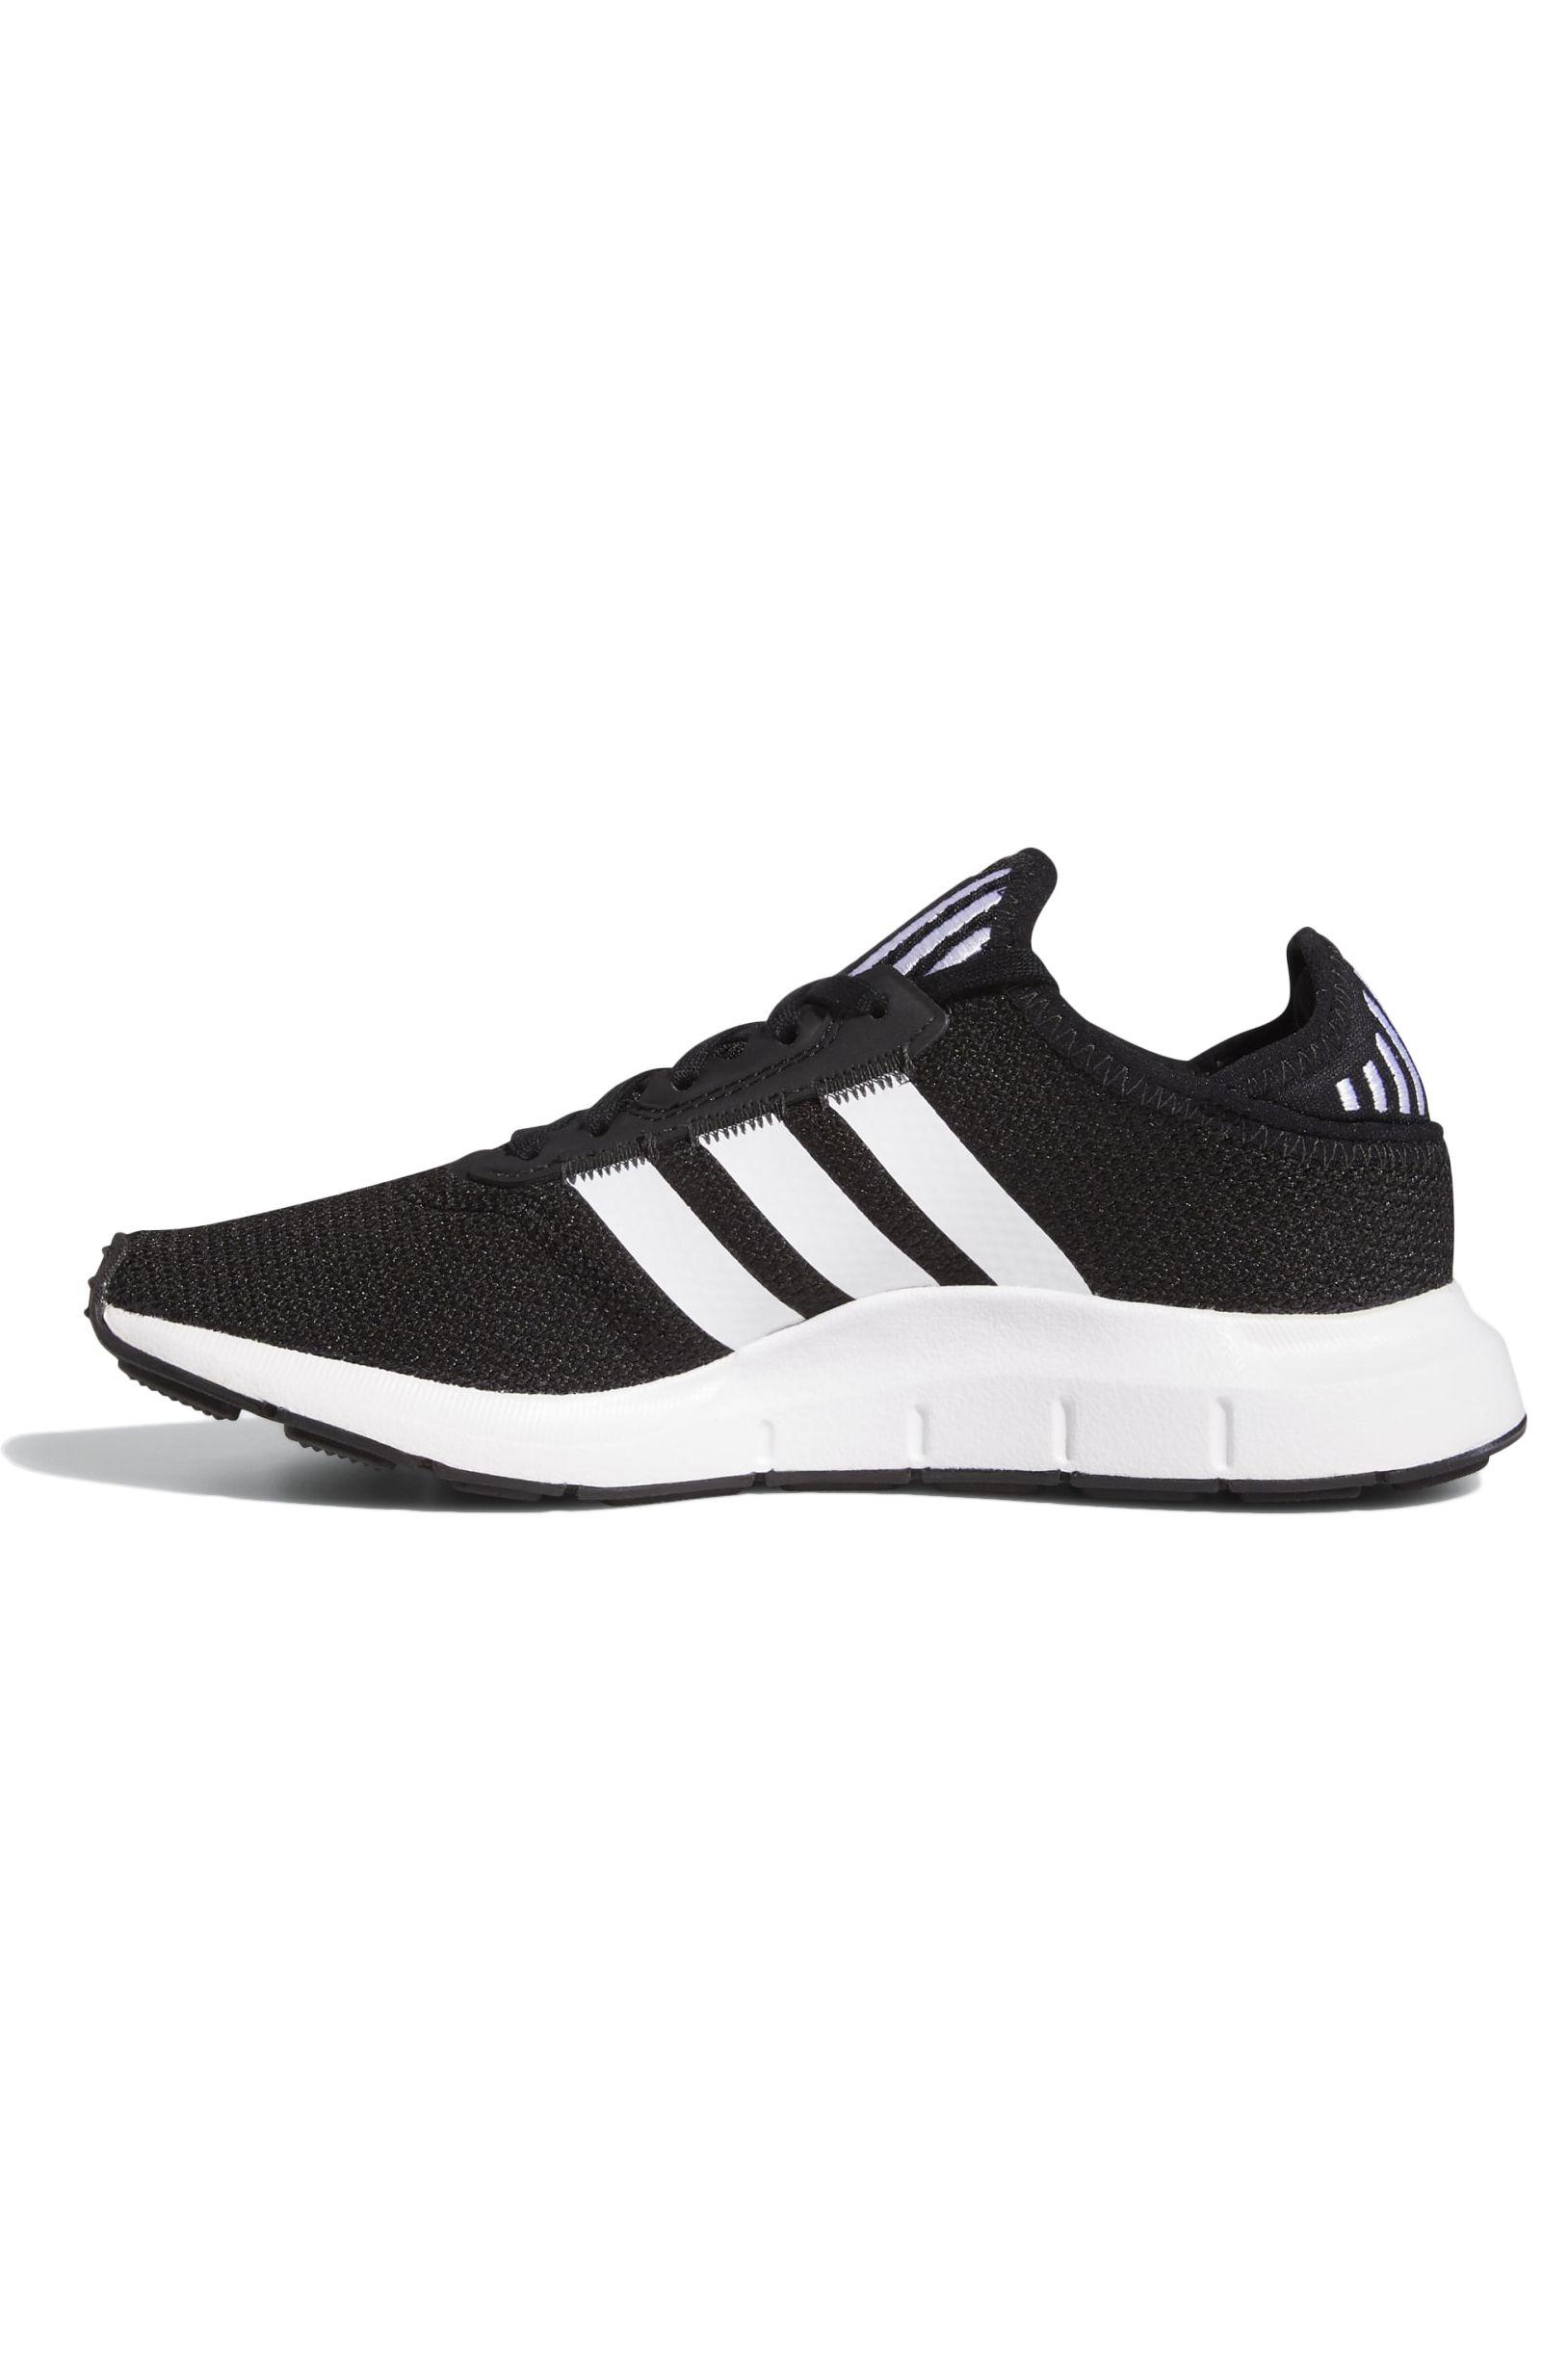 Adidas Shoes SWIFT RUN X J Core Black/Ftwr White/Core Black